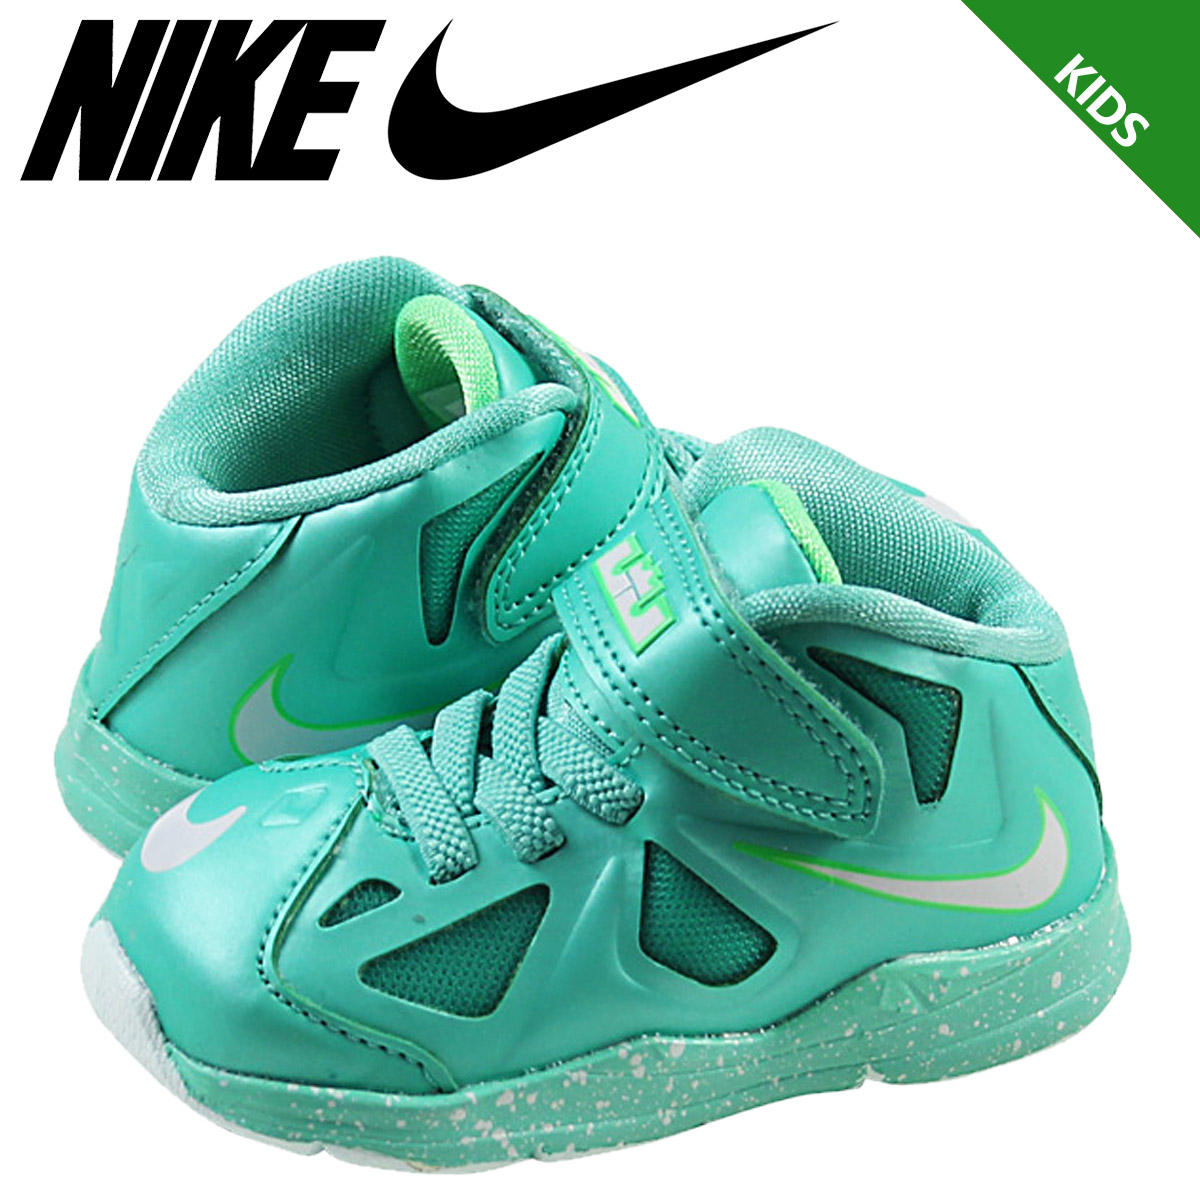 Noke Kids Shoes